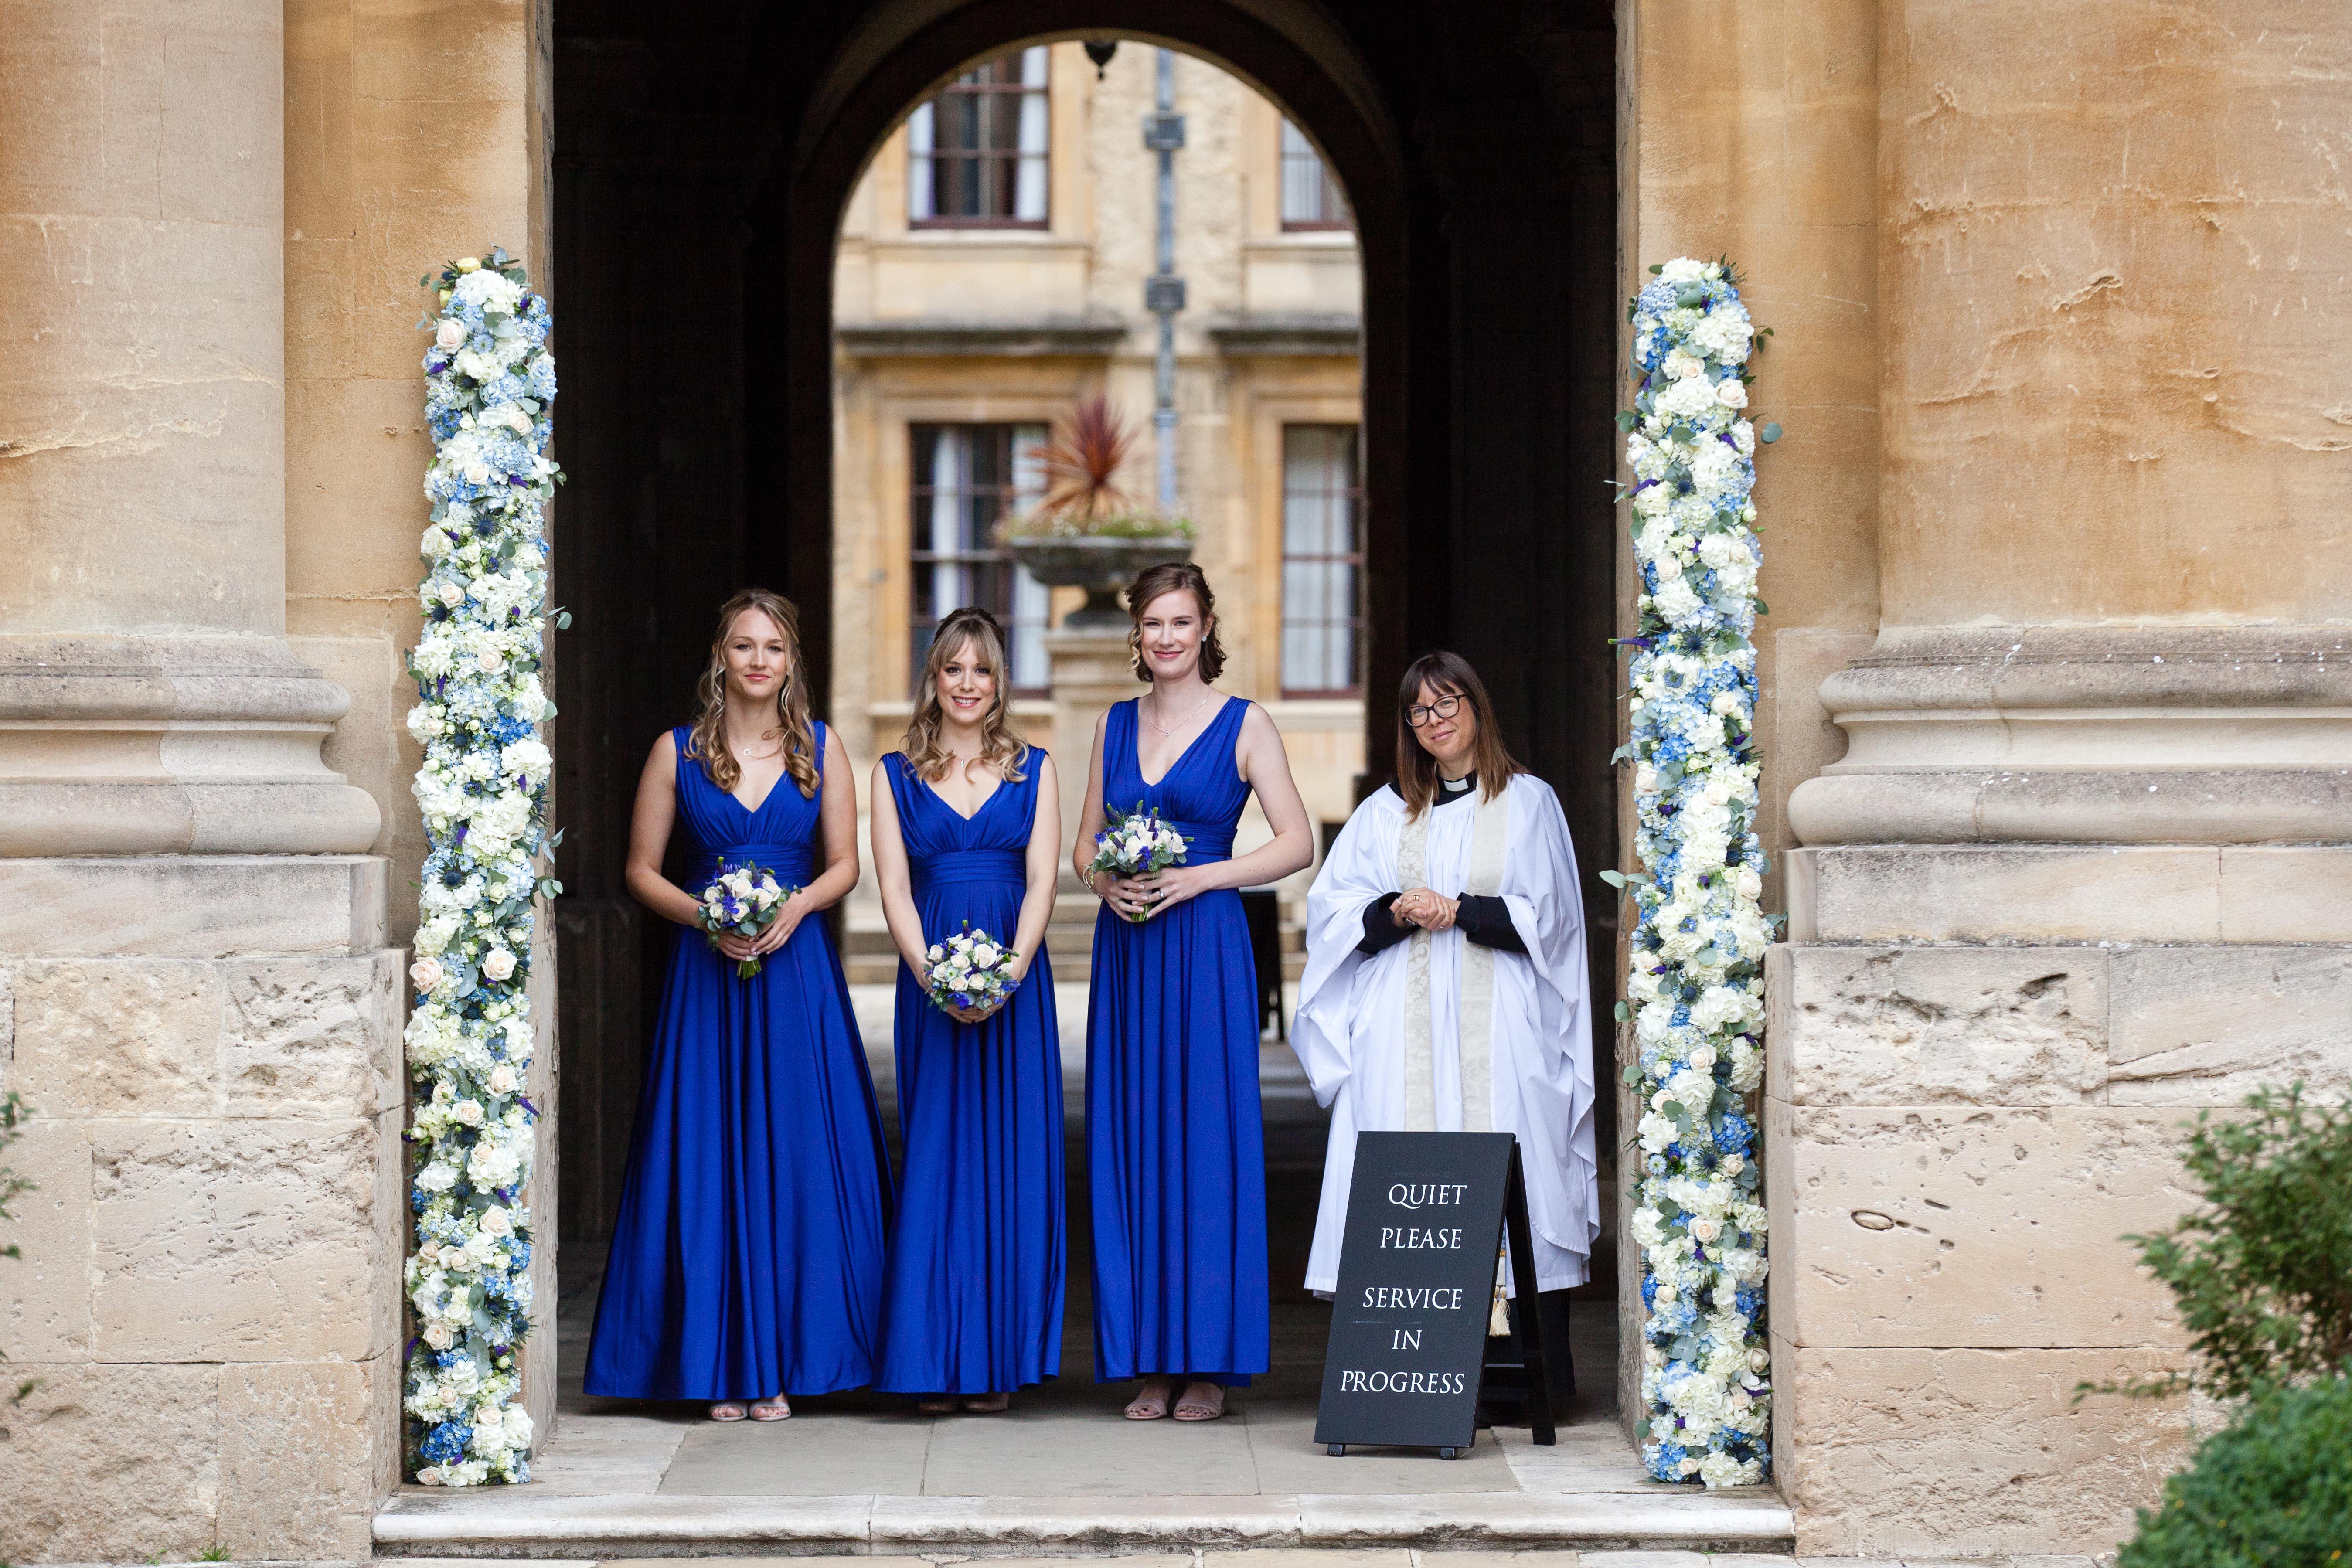 Oxford College Wedding Flowers Queen's College Oxford Joanna Carter Wedding Flowers Oxford Oxfordshire Buckinghamshire Berkshire London